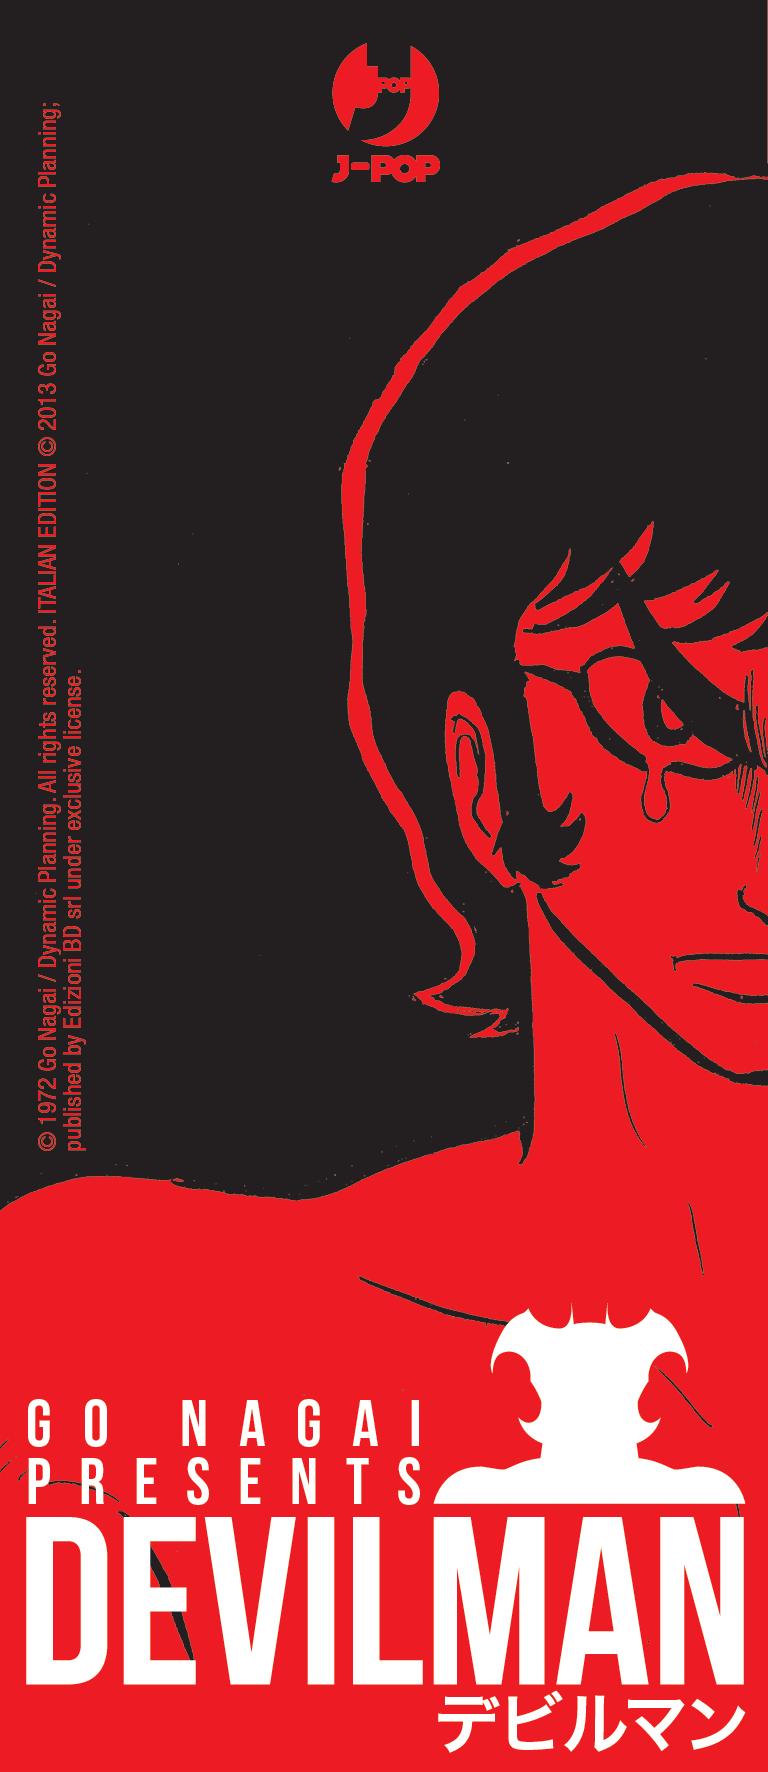 devilman manga go nagai j-pop gp publishing segnalibro esclusivo